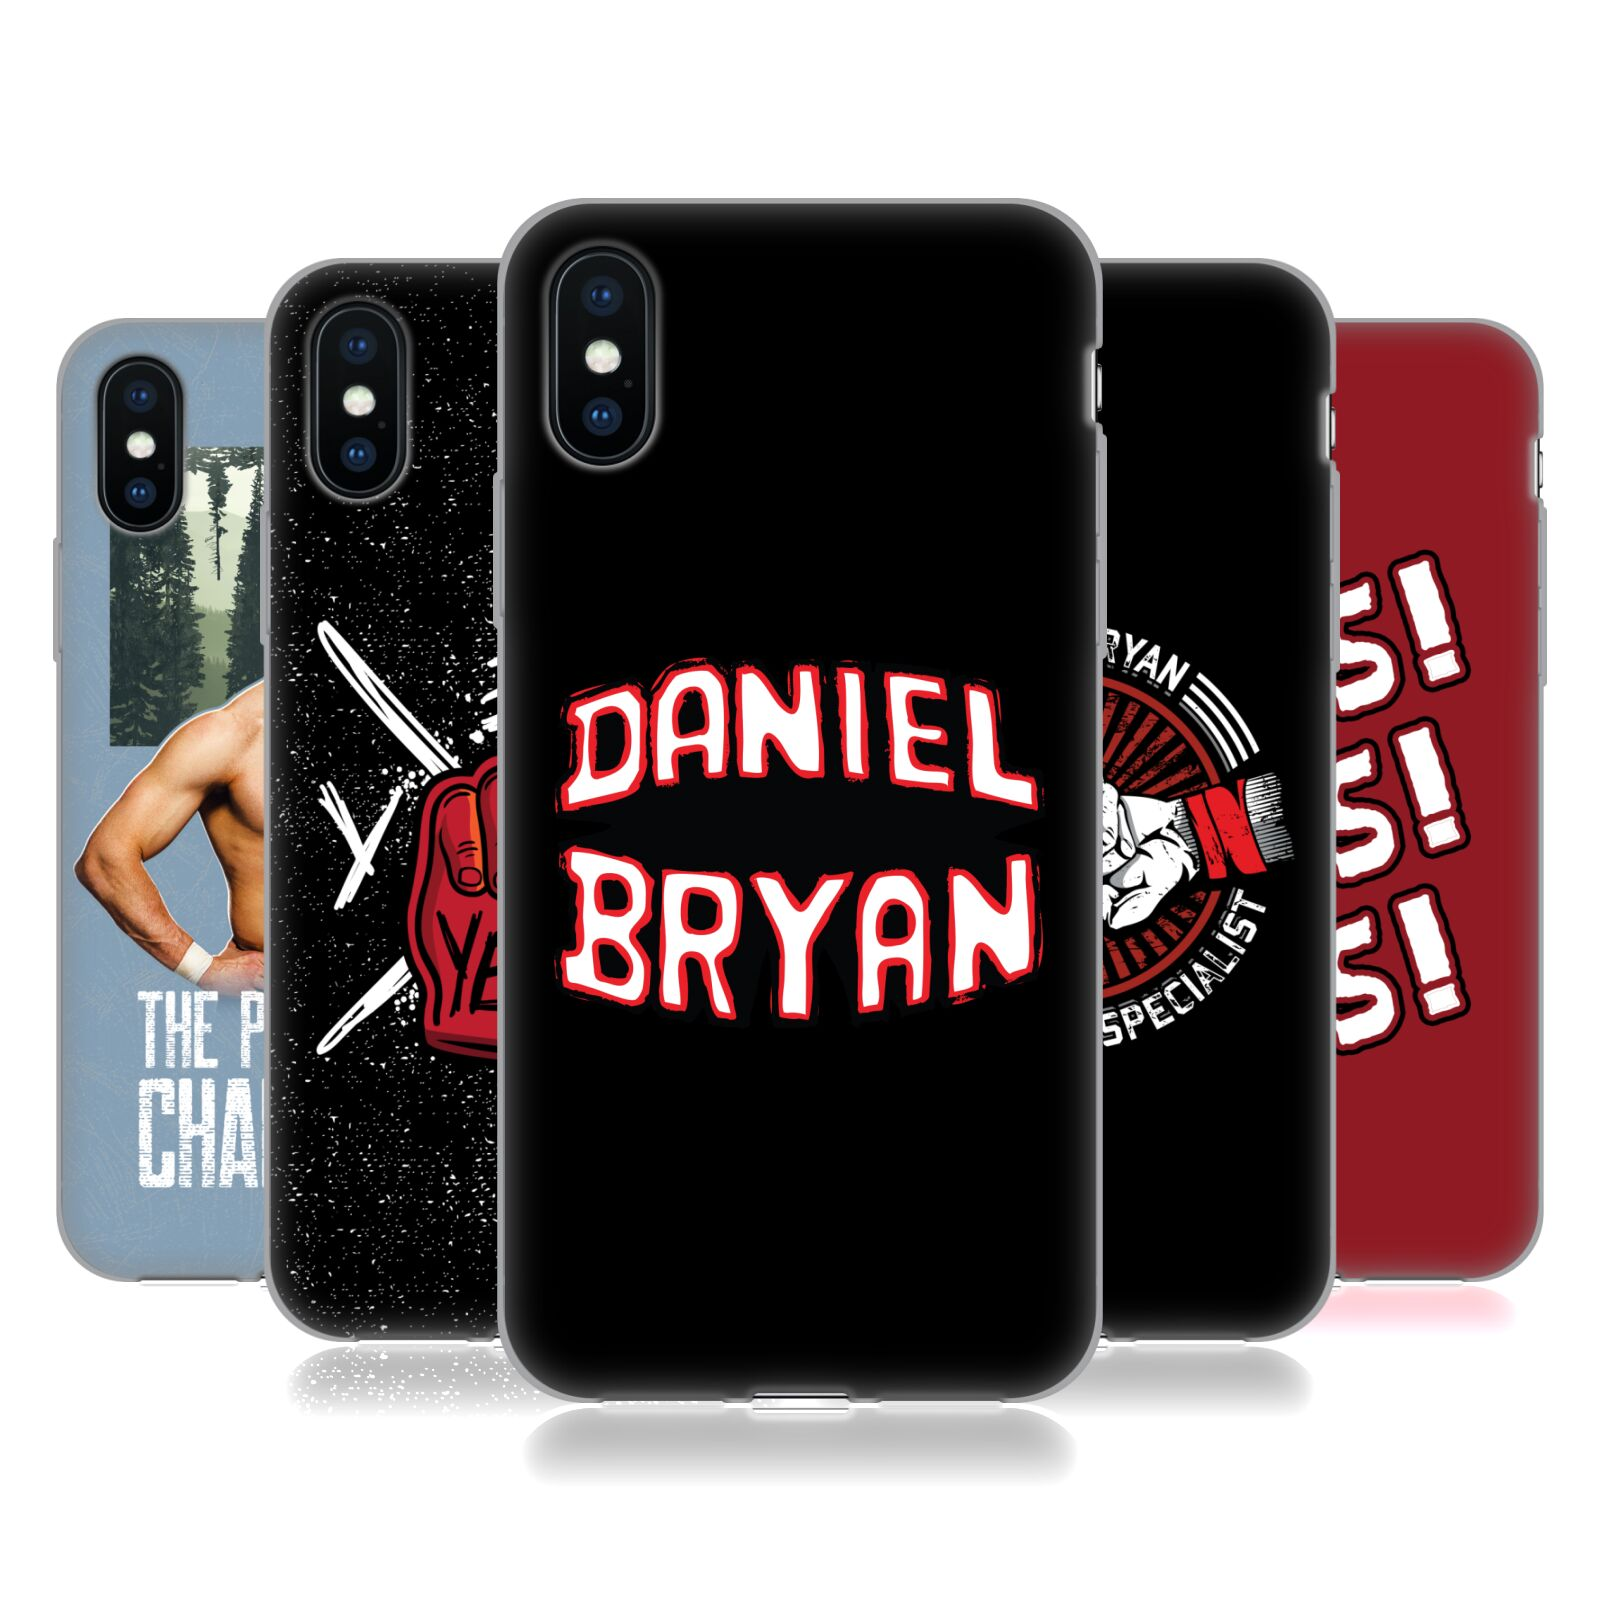 WWE <!--translate-lineup-->Daniel Bryan<!--translate-lineup-->